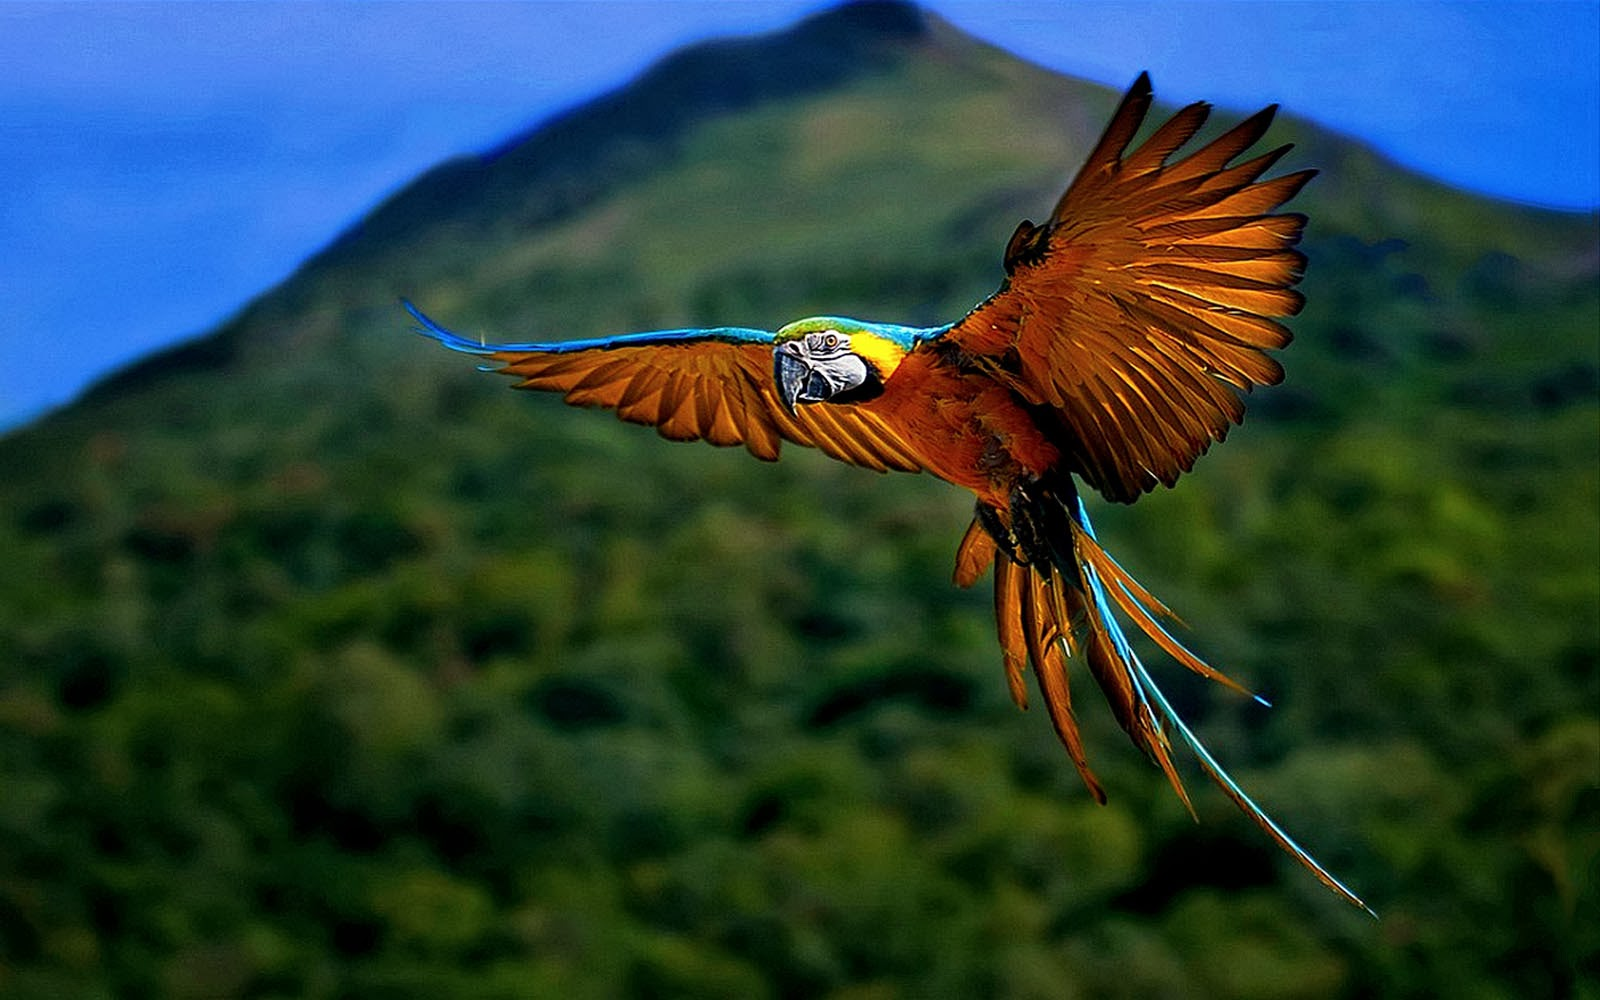 wallpapers: Macaw Bird Wallpapers